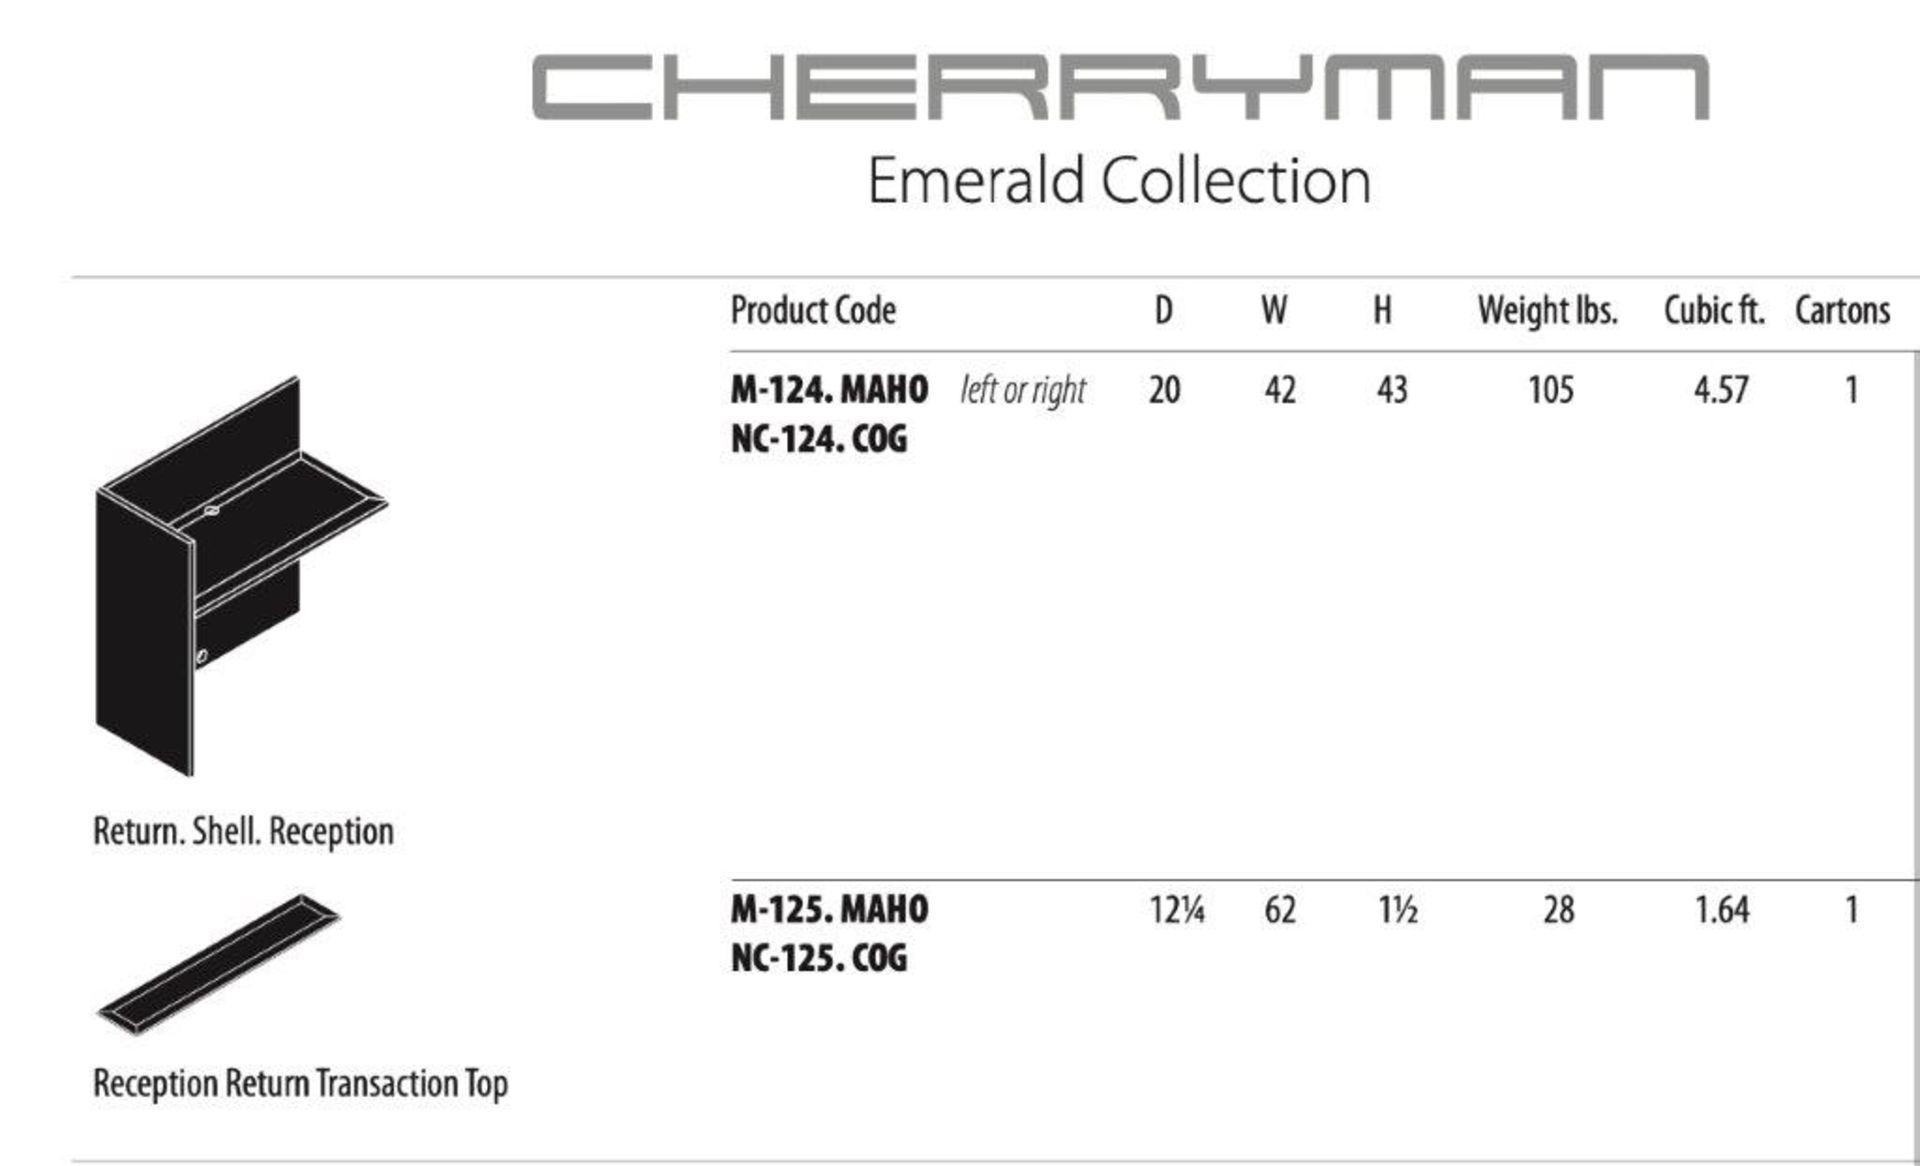 Cherryman Emerald Collection Mahogany Reception Return (M124) (Original List price each: $1,000) - Image 2 of 3